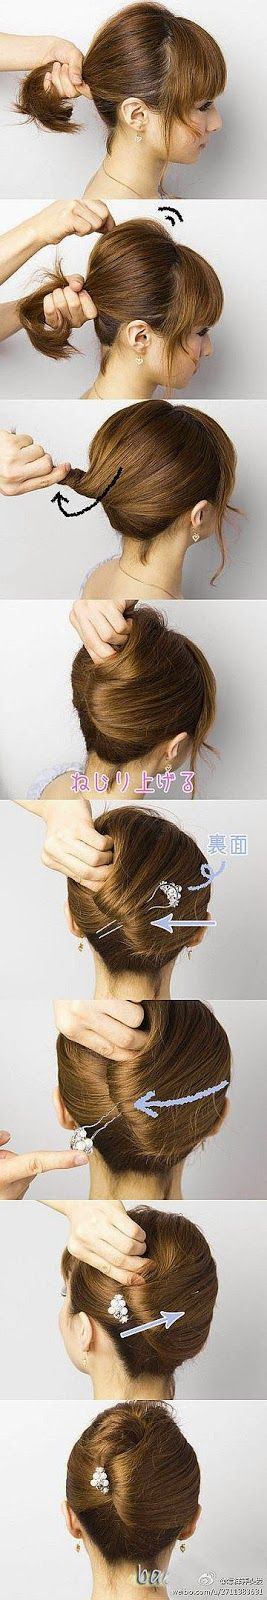 New hair tutorial